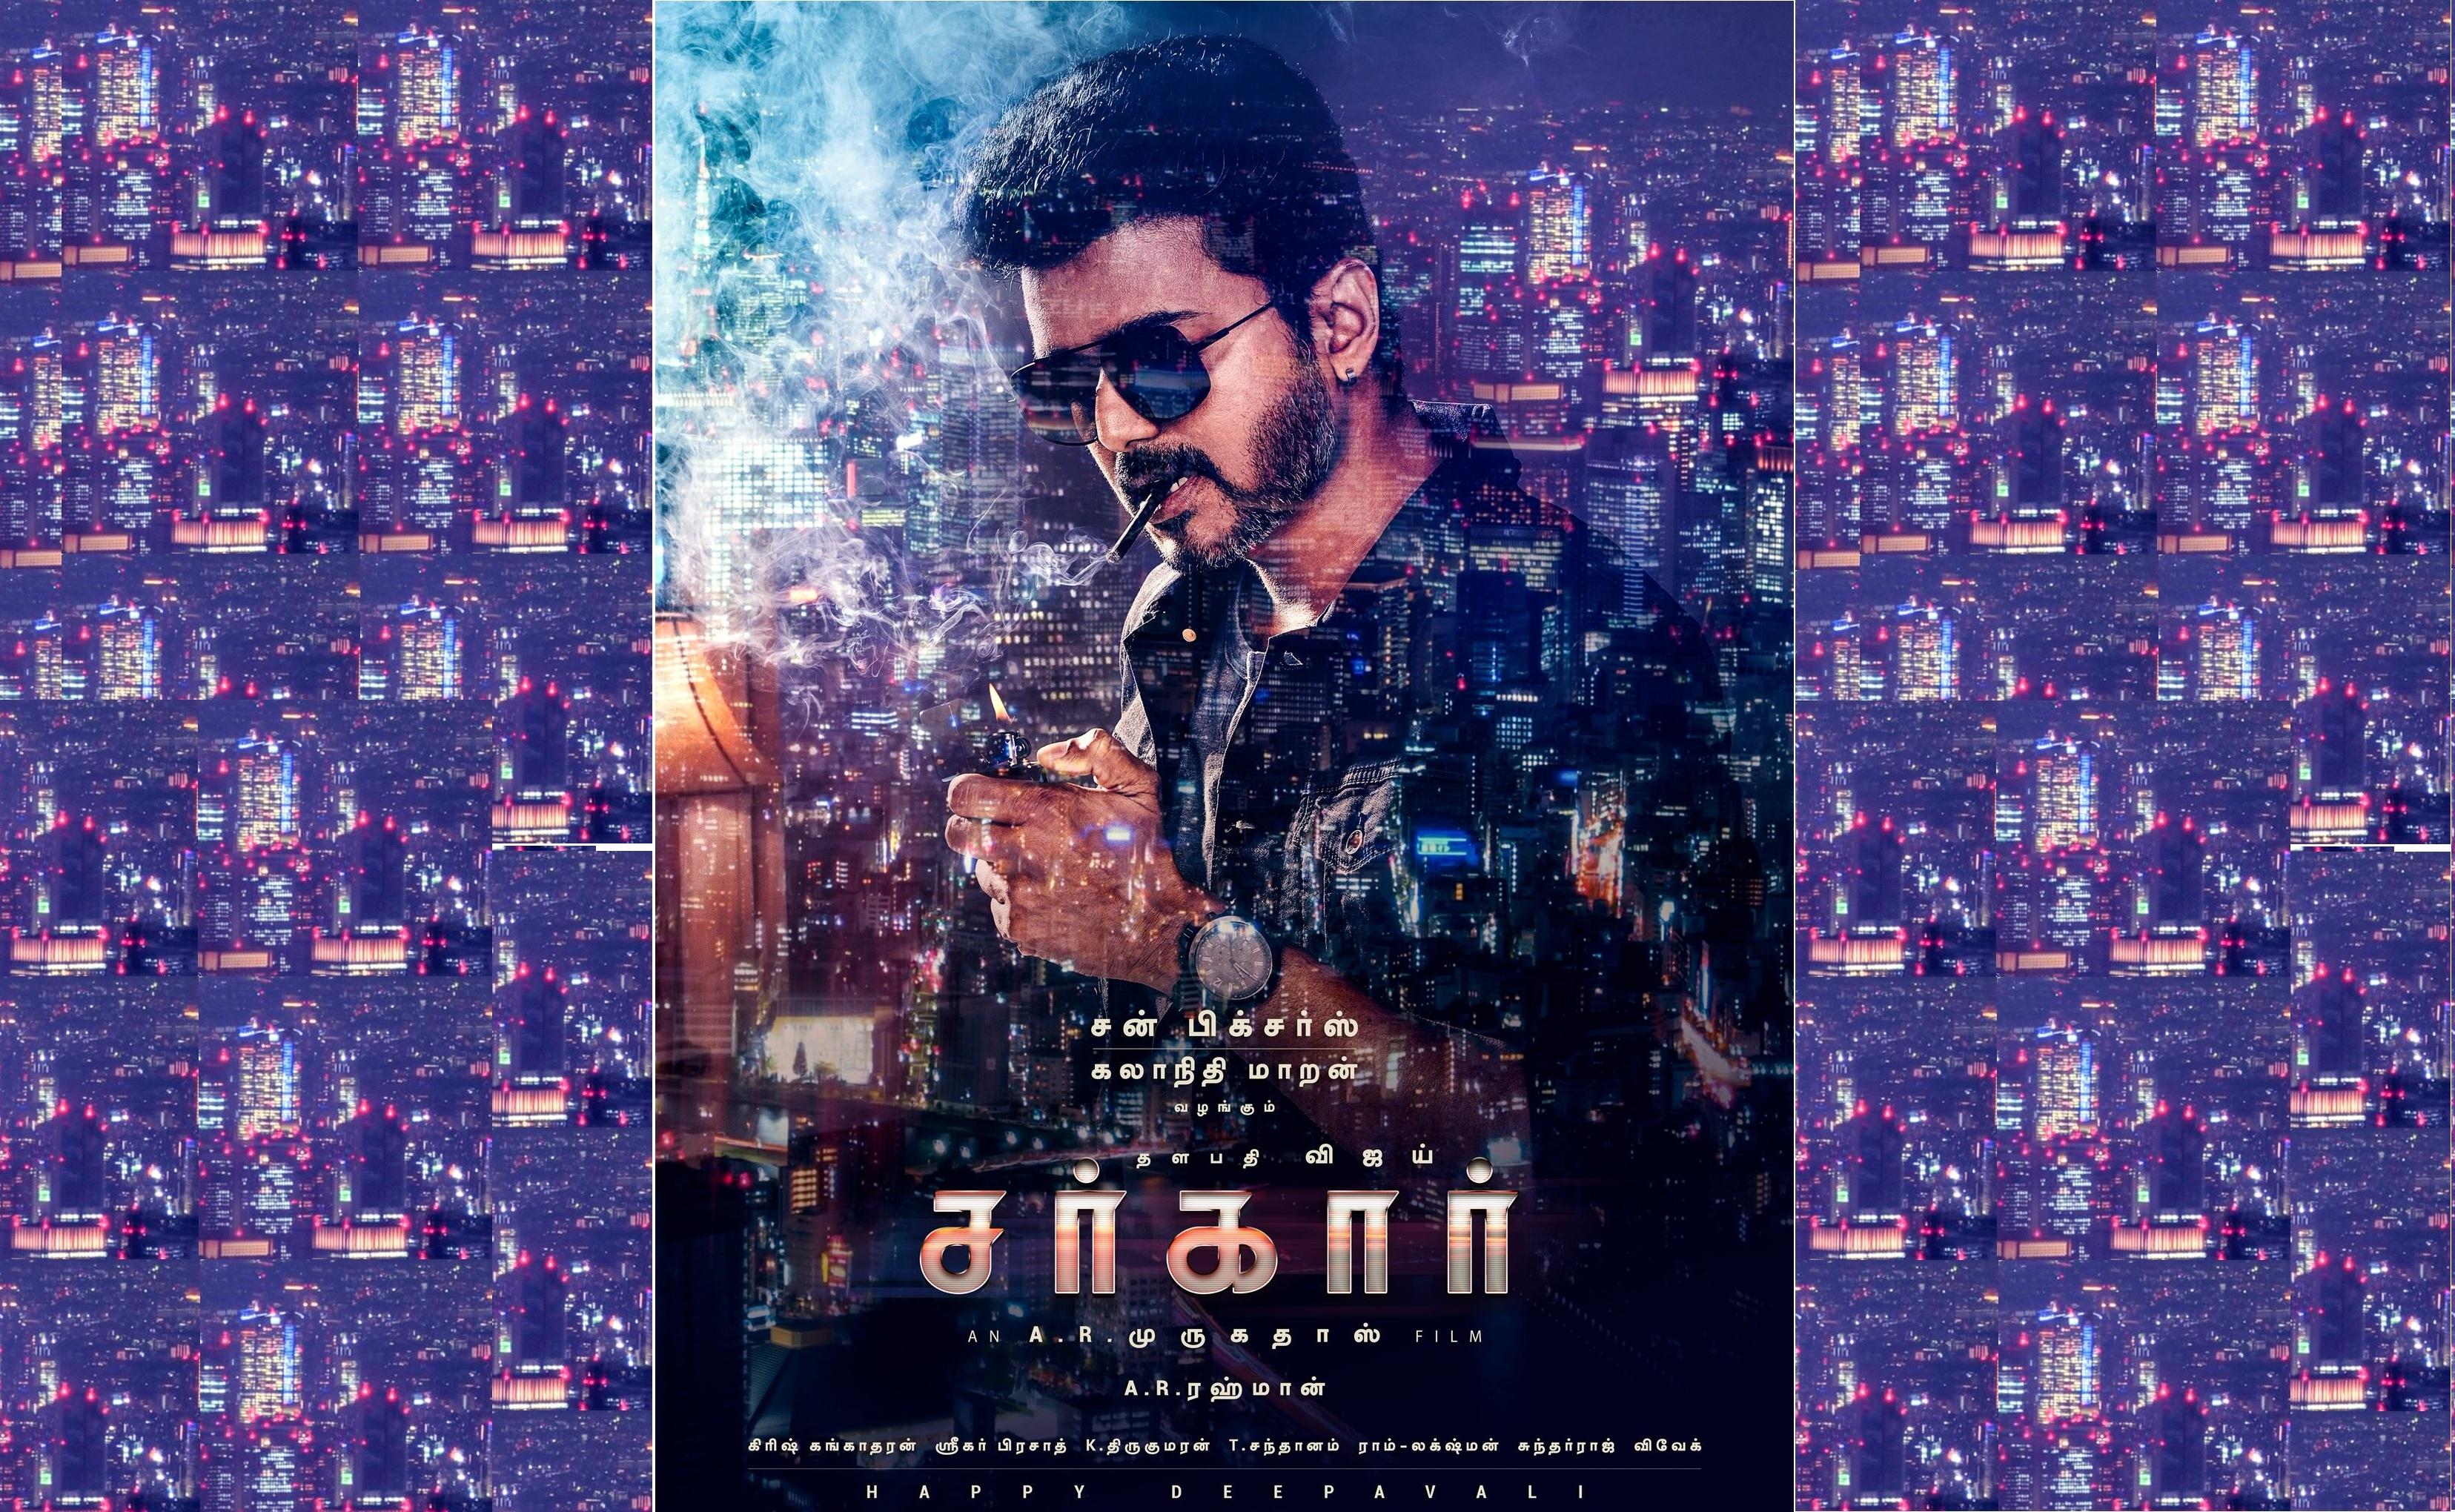 Kamal Raja Hd Wallpaper Sarkar Tamil Movie 2018 Cast Amp Crew Trailer Amp Teaser